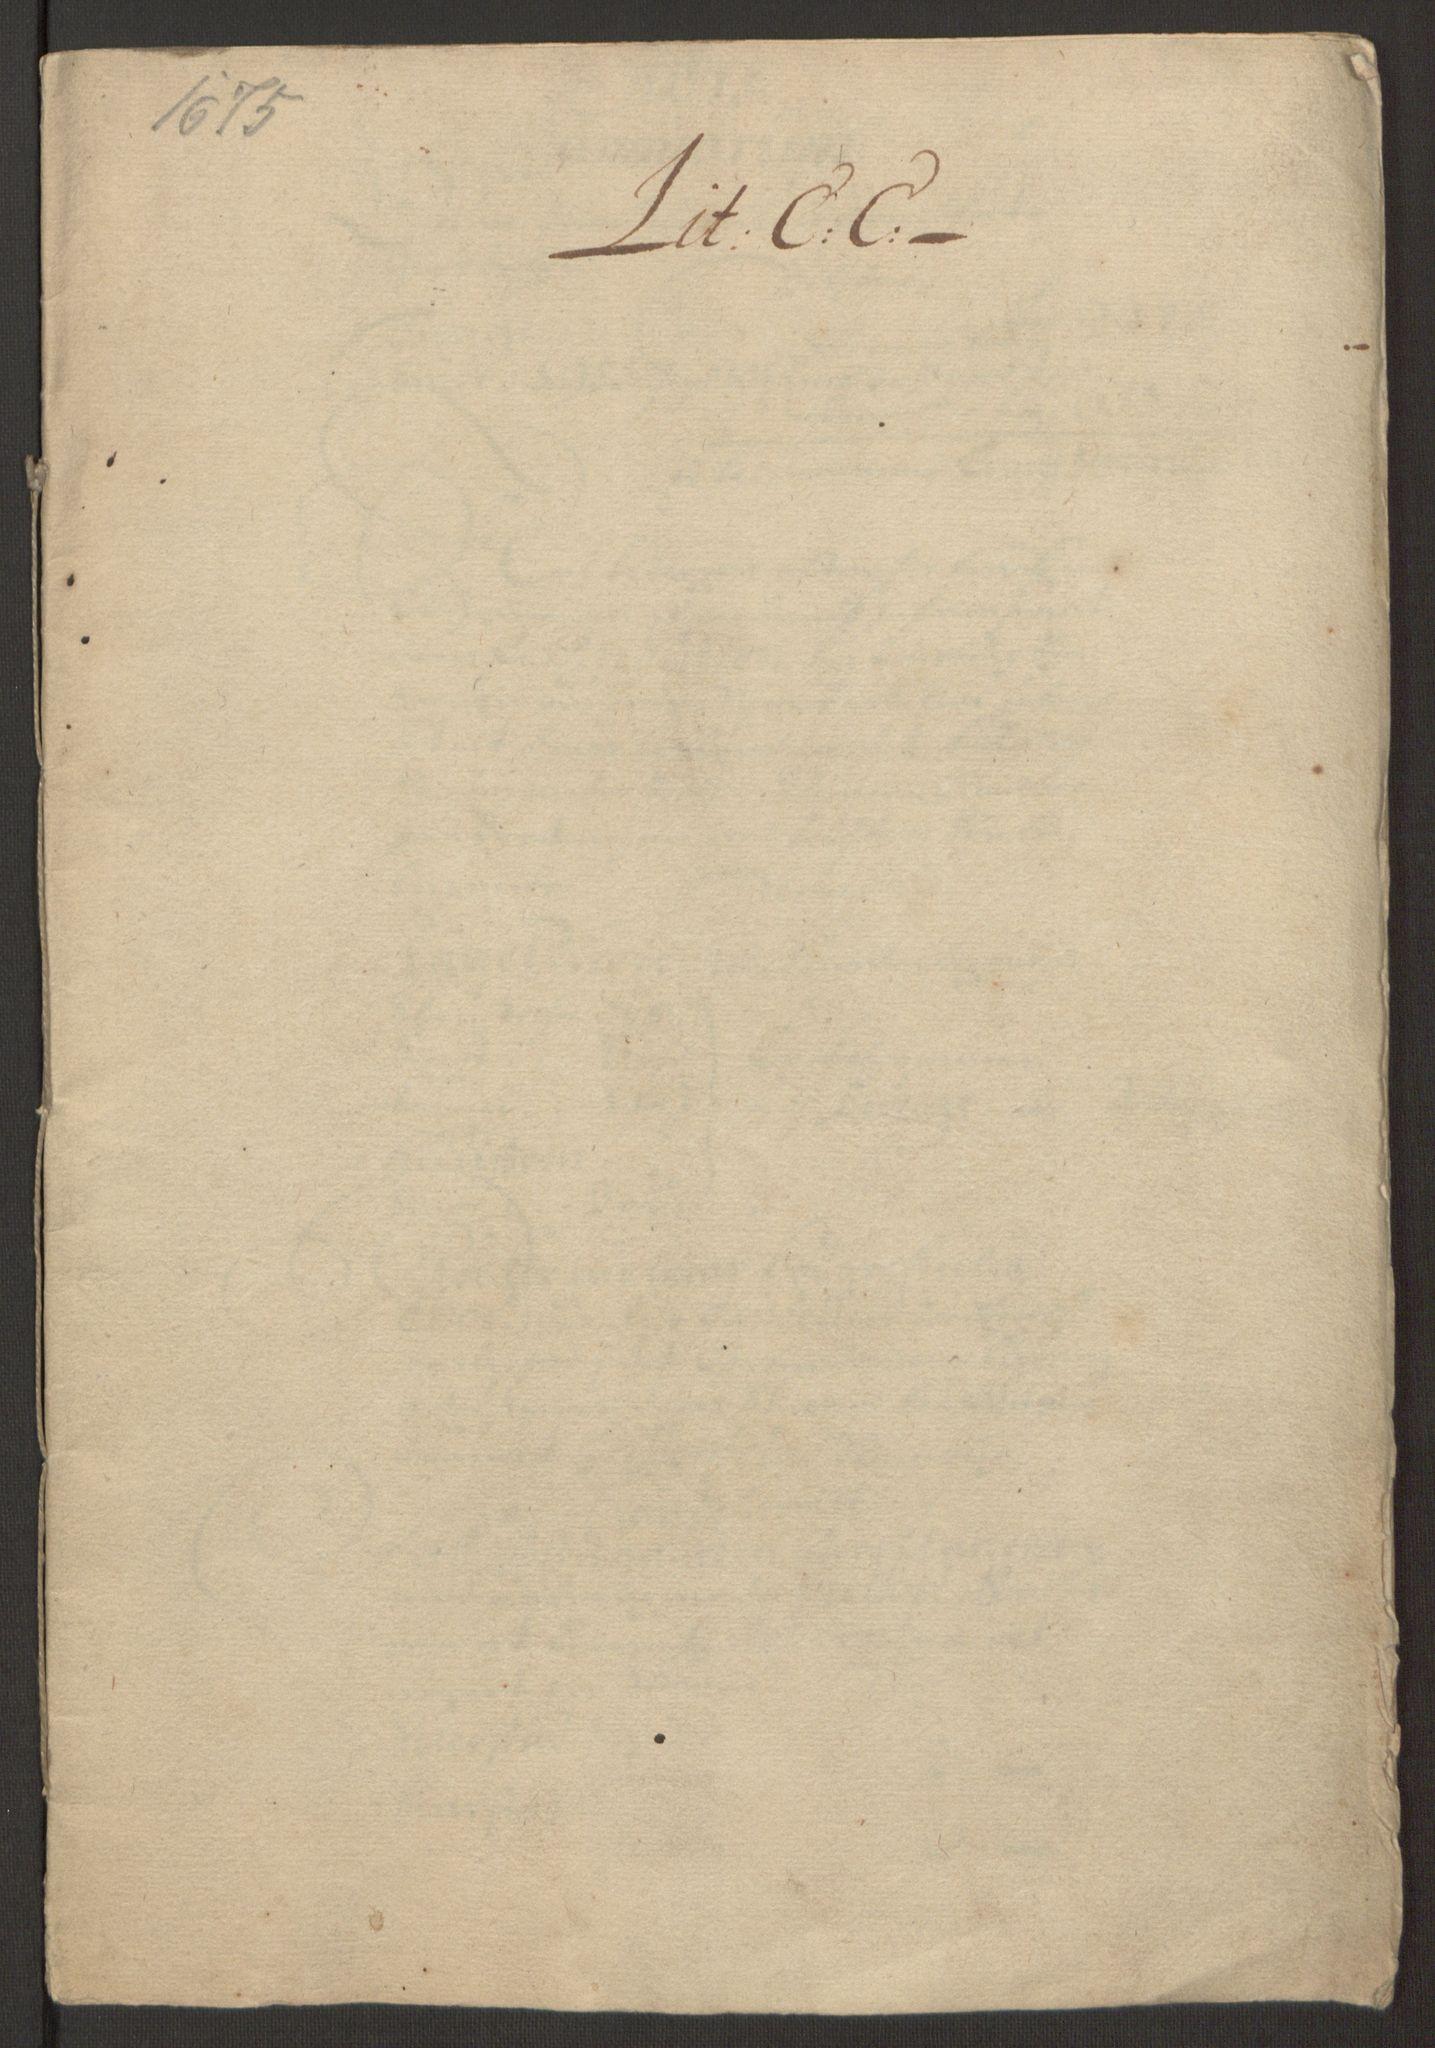 RA, Rentekammeret inntil 1814, Reviderte regnskaper, Fogderegnskap, R32/L1843: Fogderegnskap Jarlsberg grevskap, 1674-1675, s. 478